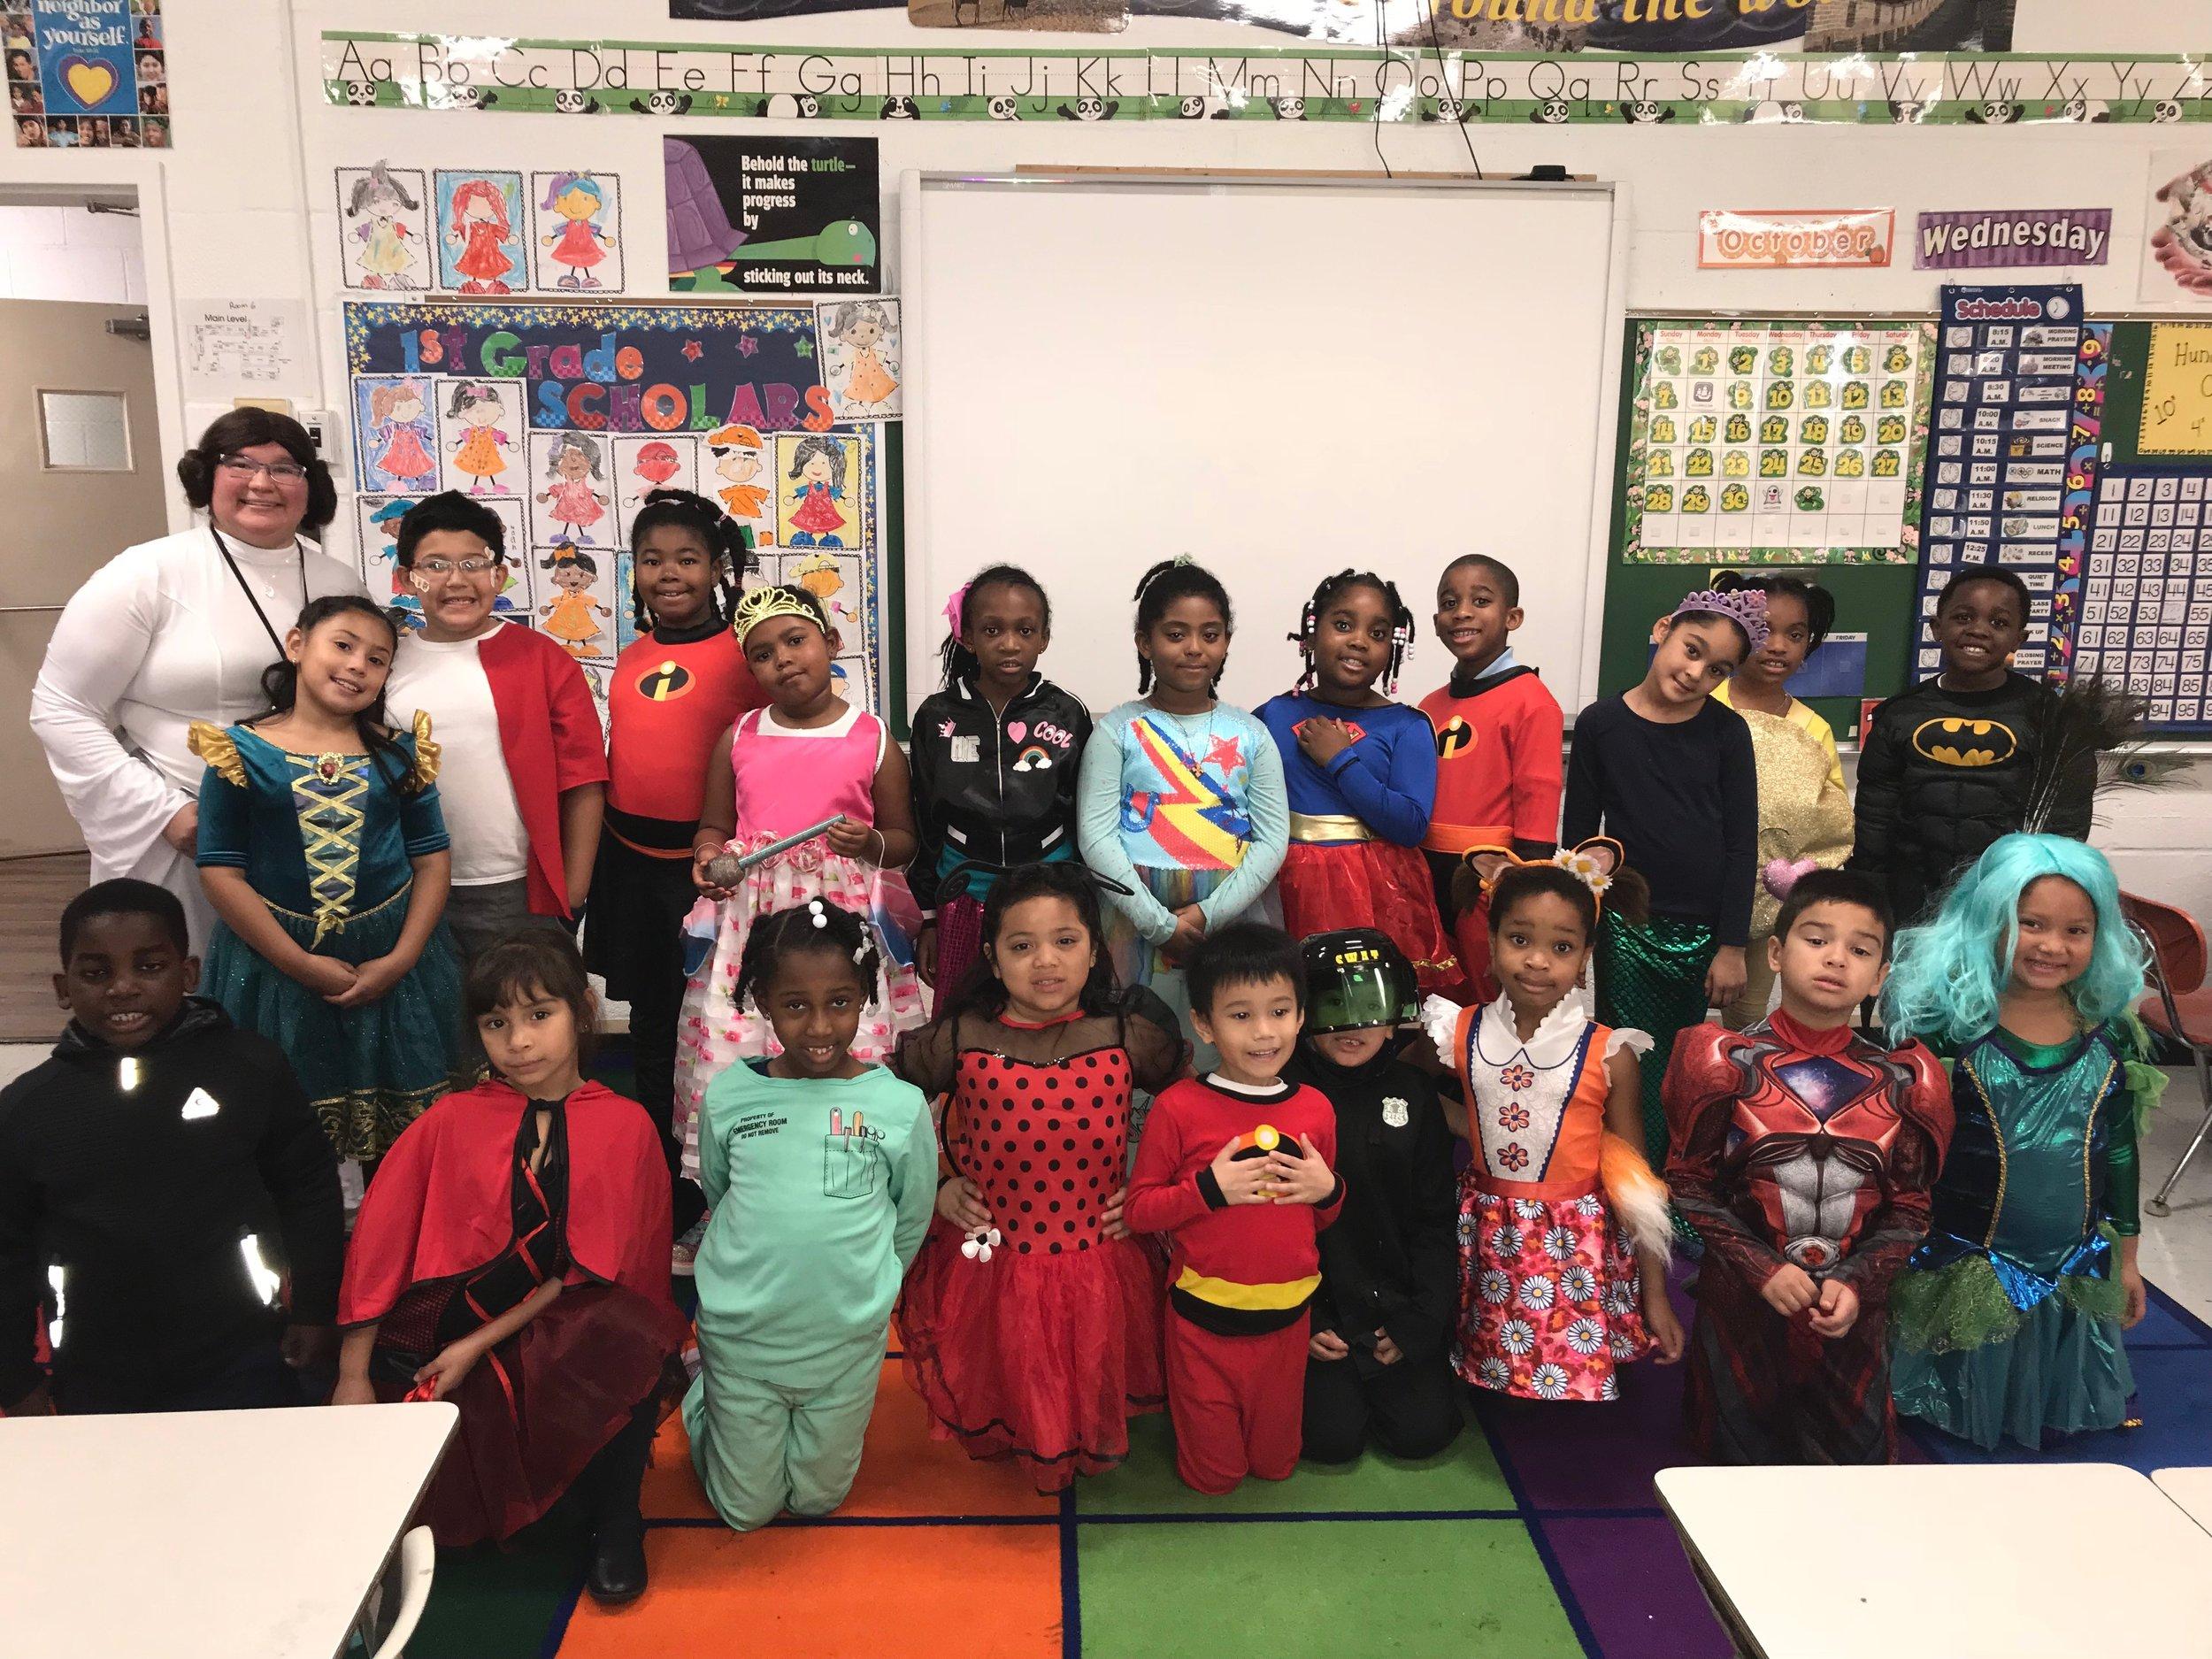 First Grade Halloween Costumes - October 31, 2018